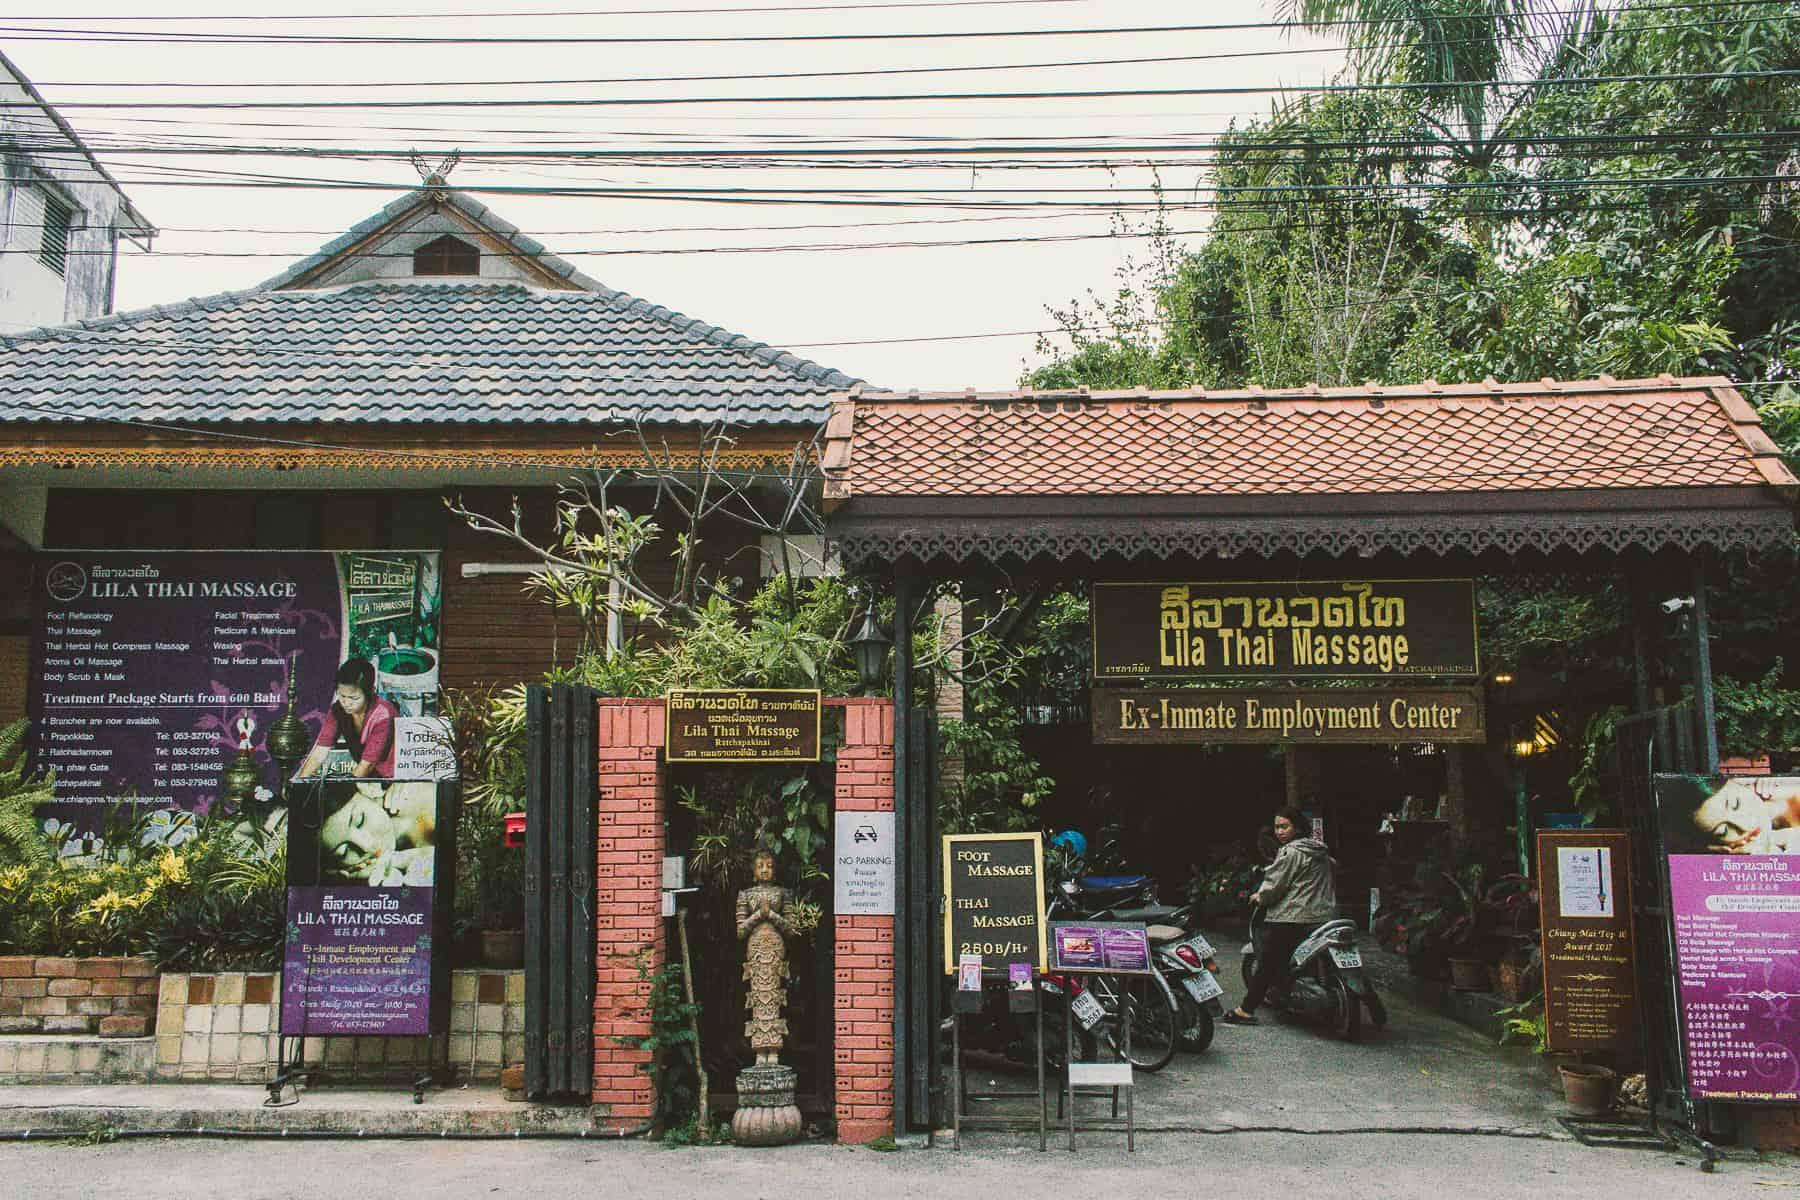 seksi kauppa paras thai hieronta